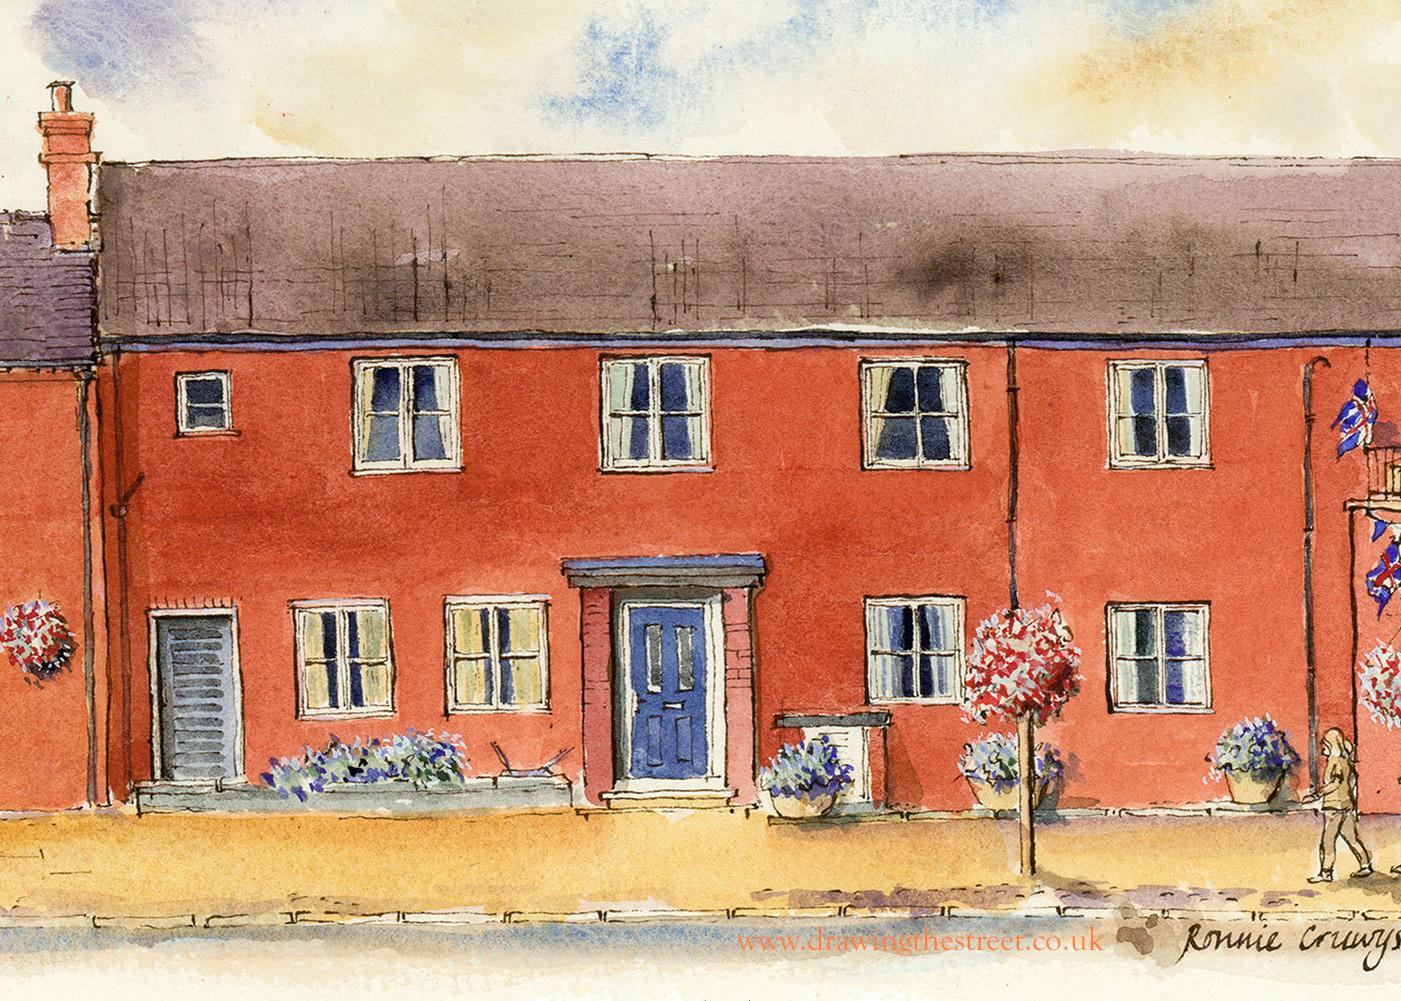 9-john-pershall-court-high-street-eccleshall-high-street-ronnie-cruwys